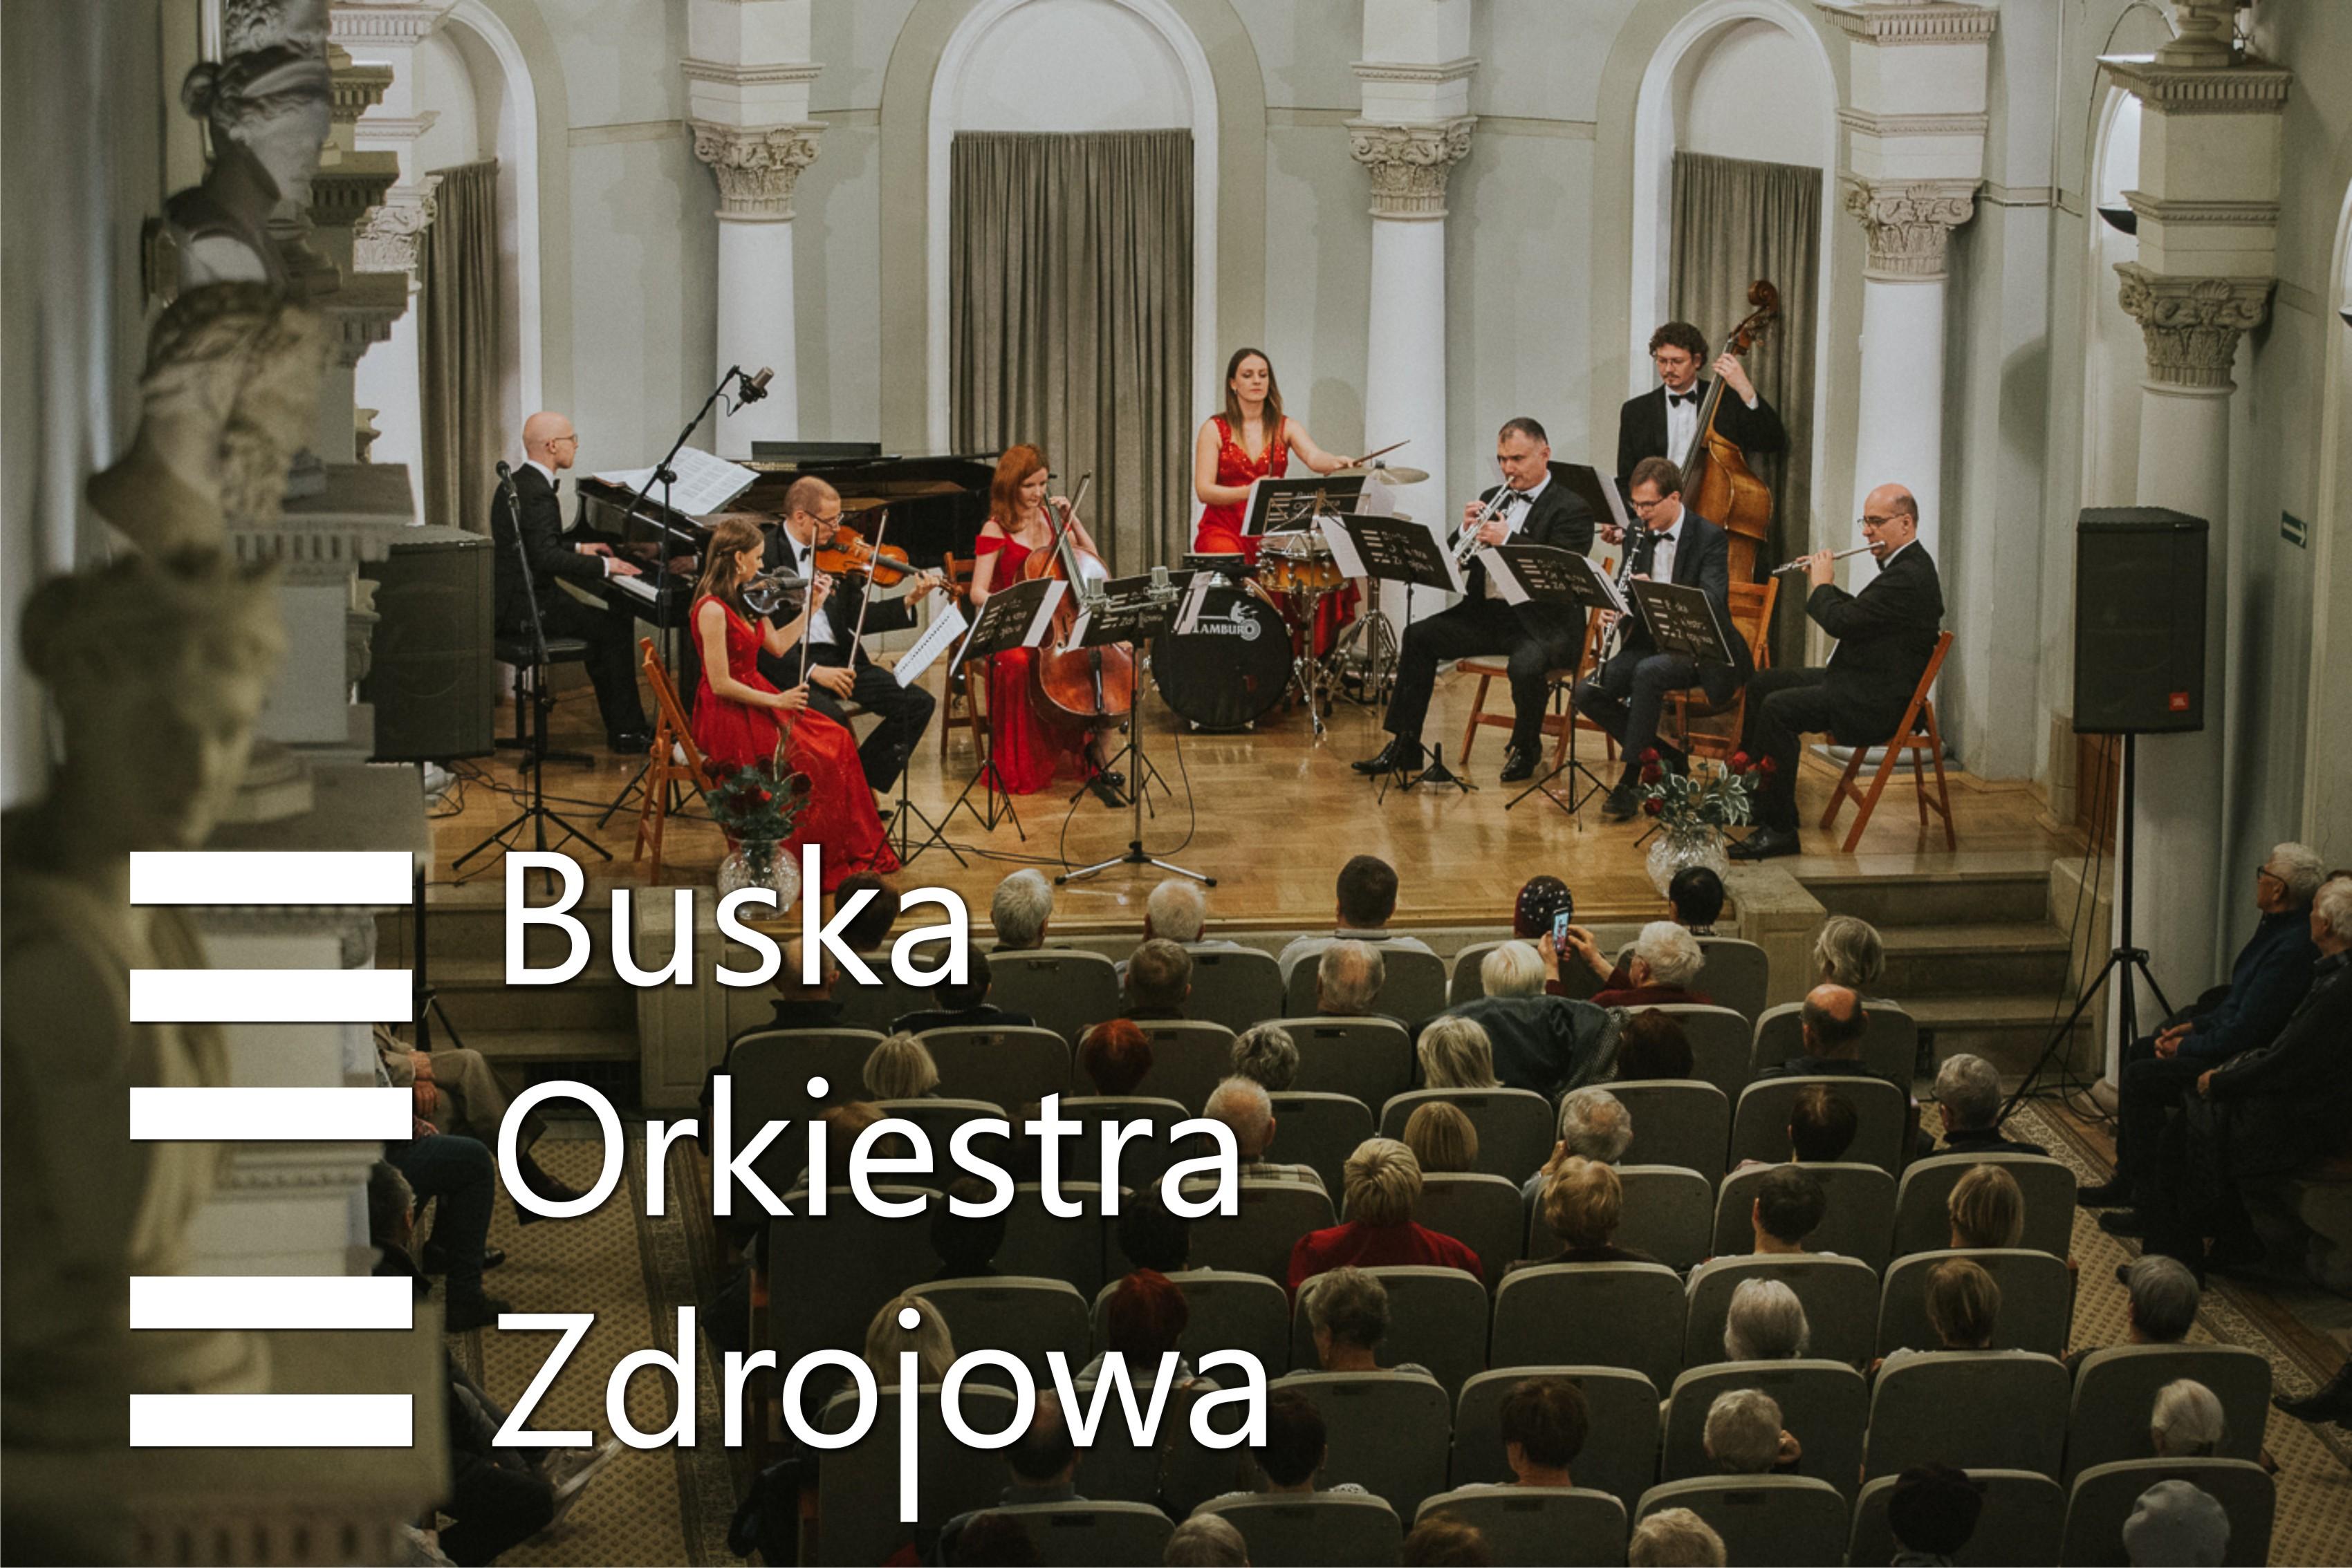 Buska Orkiestra Zdrojowa